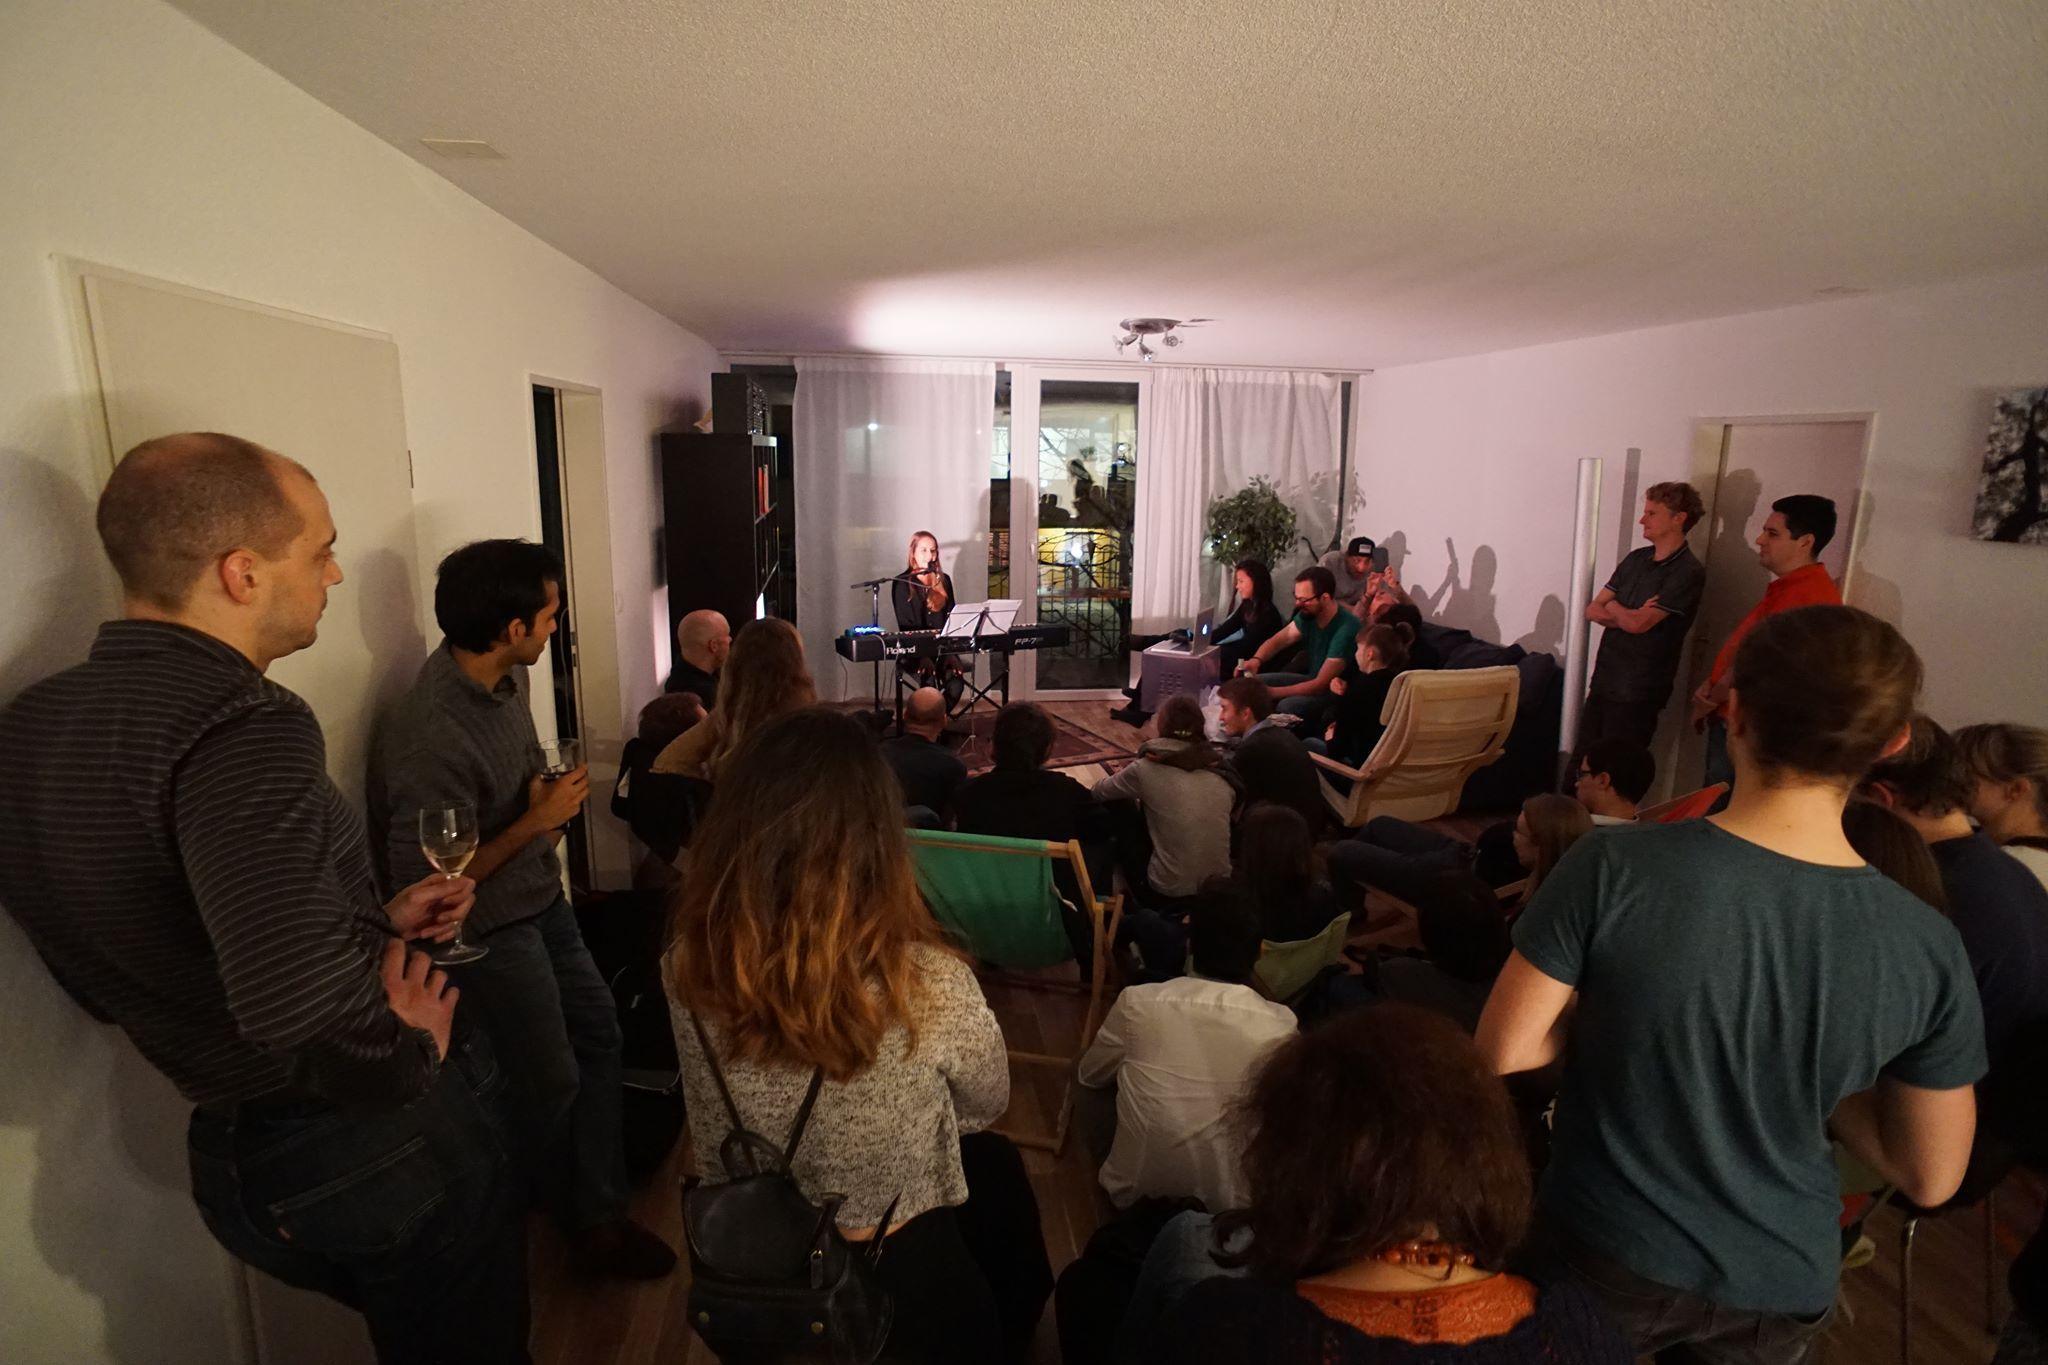 Zurich Living Room Concerts Zrich